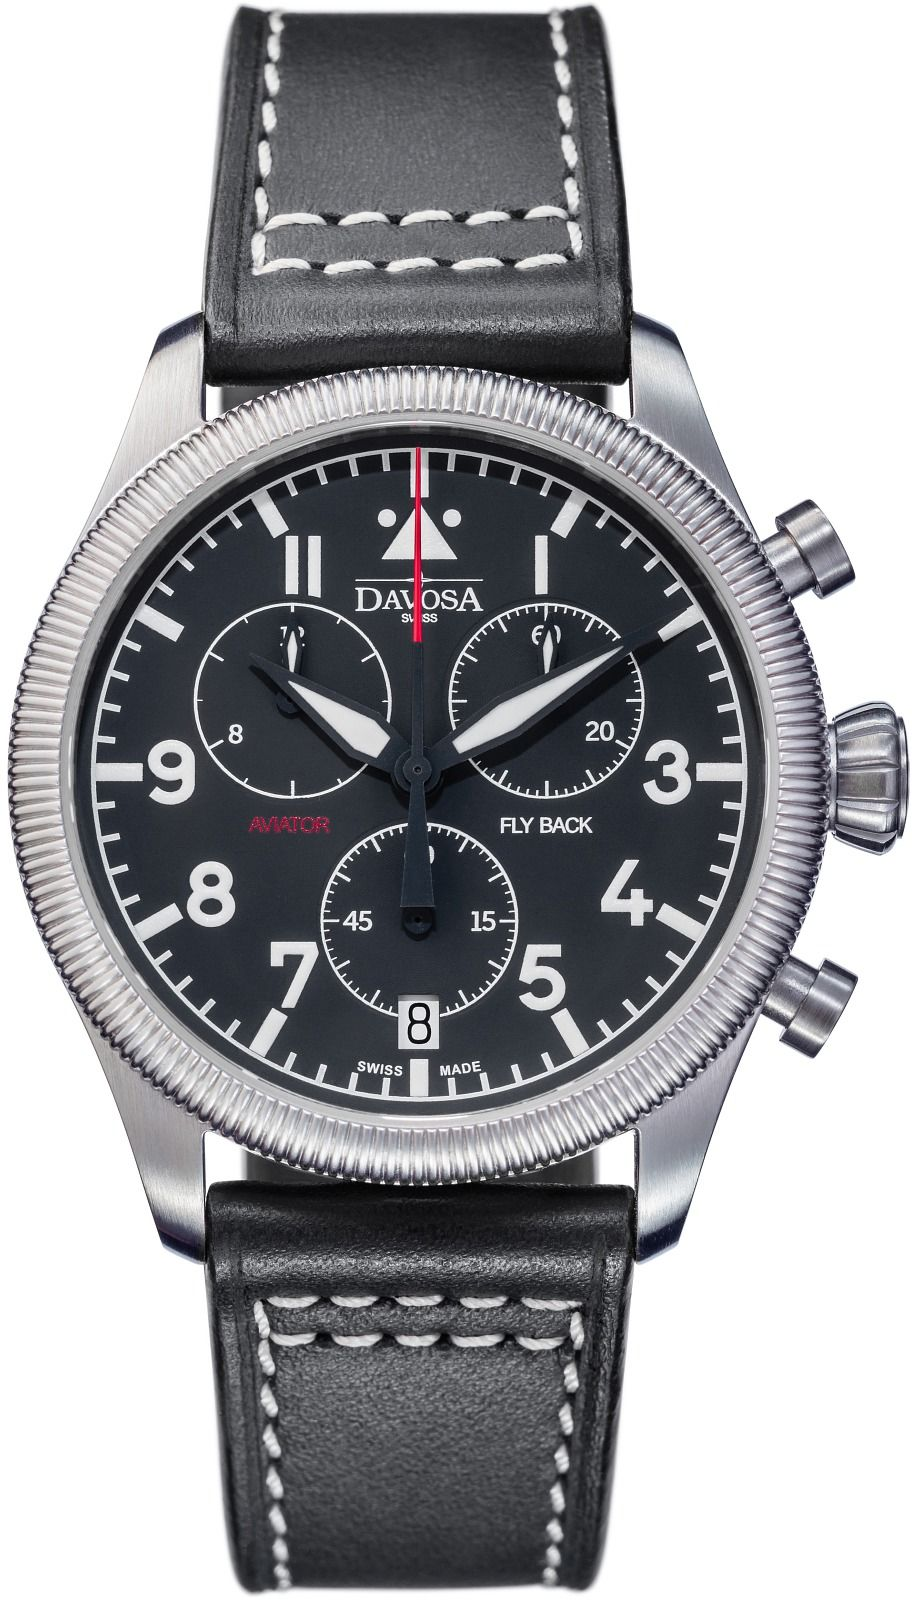 Zegarek męski Davosa Aviator Flyback Chronograph